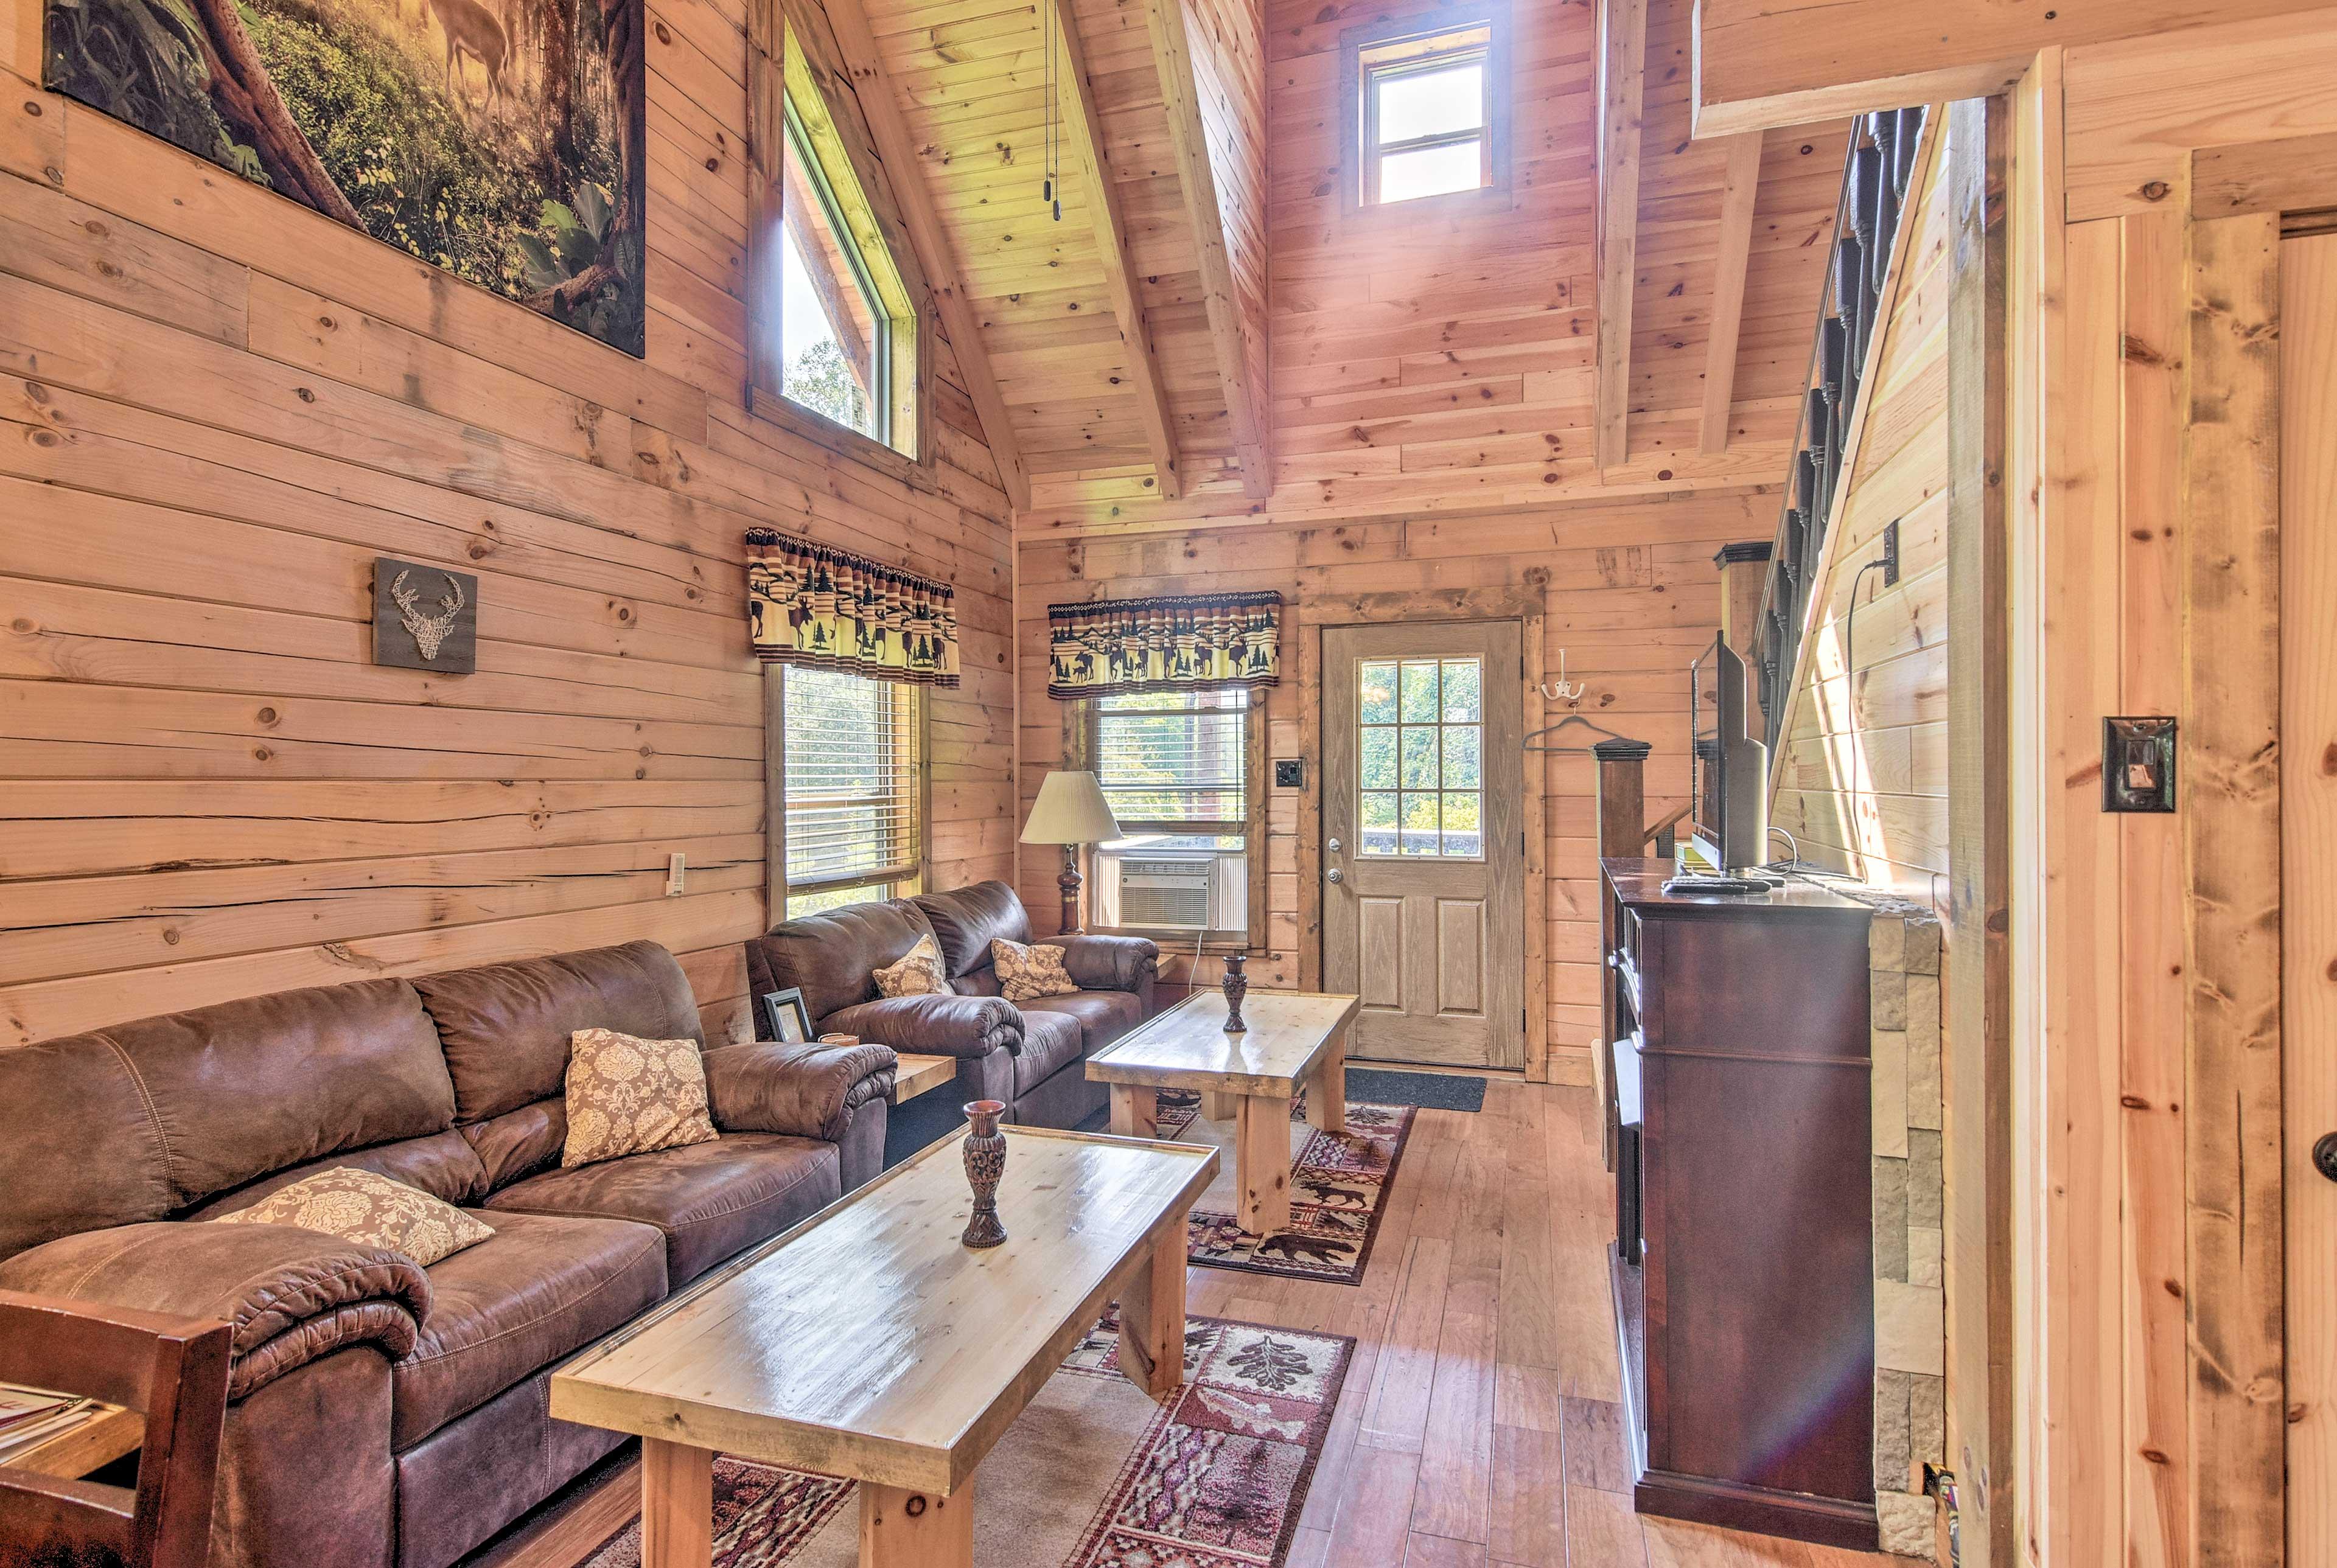 The high ceilings make this home feel super spacious!